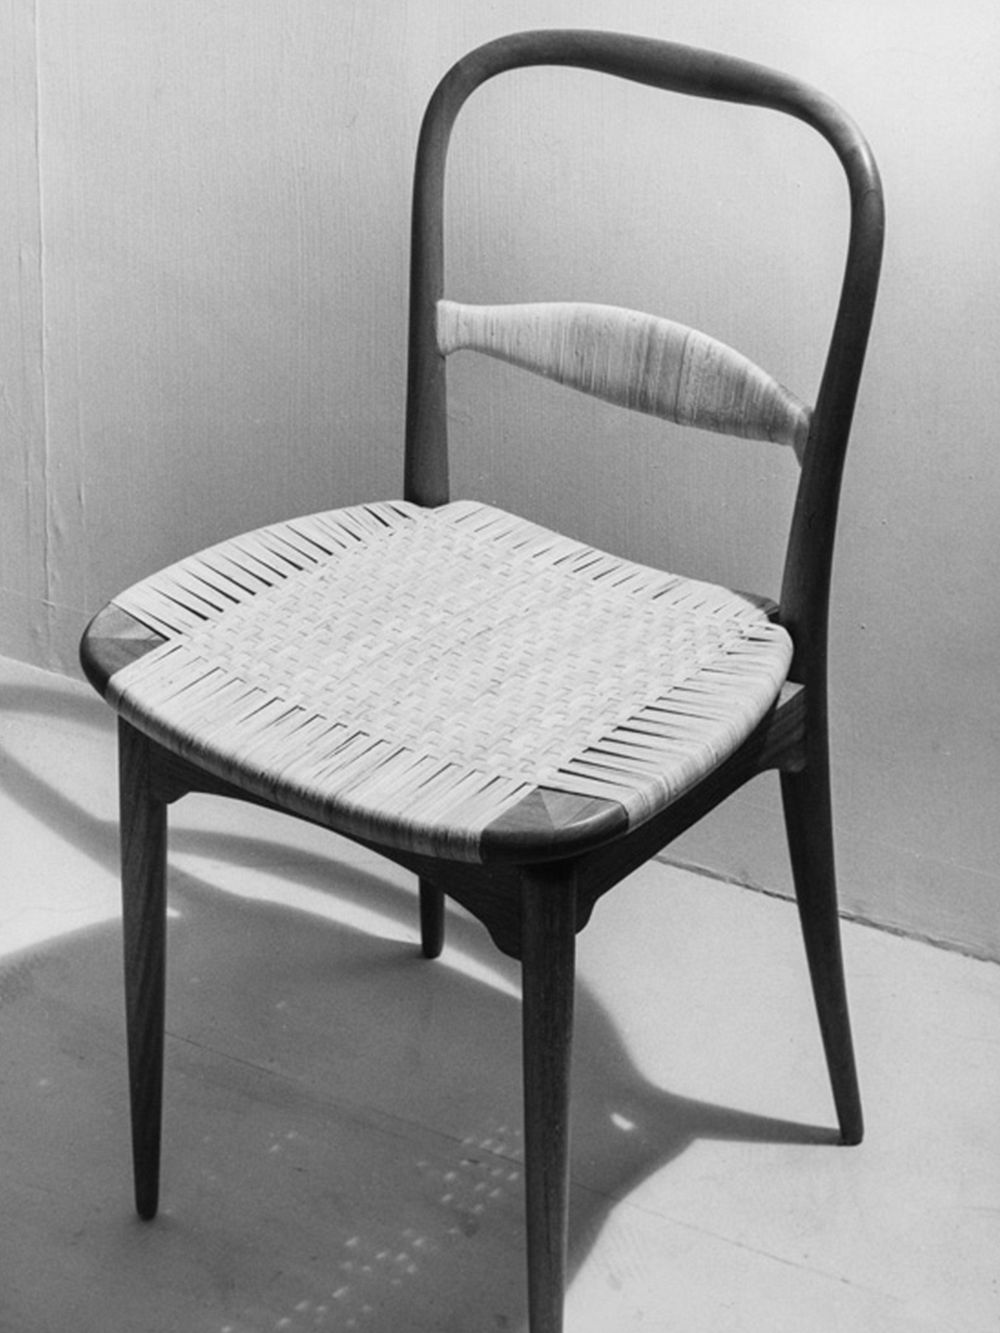 Carin Bryggmanin suunnittelema tuoli